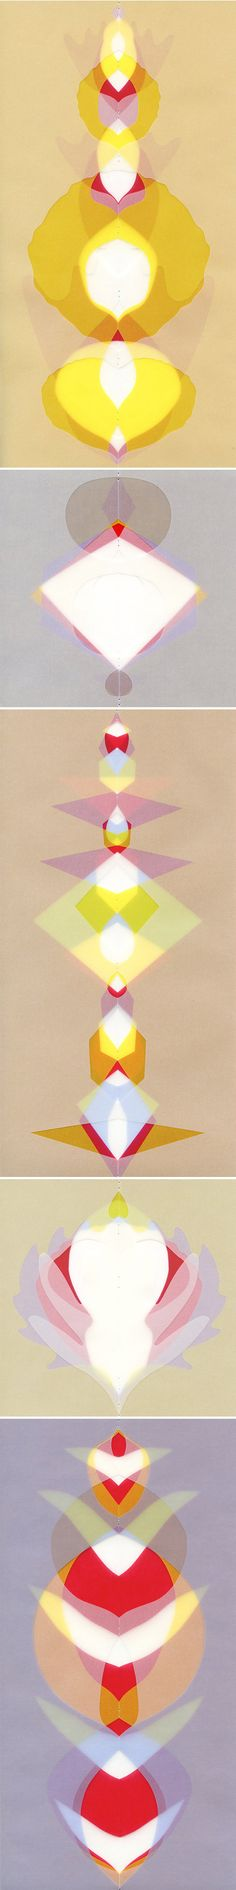 new work by shannon rankin <3 {cut vellum}